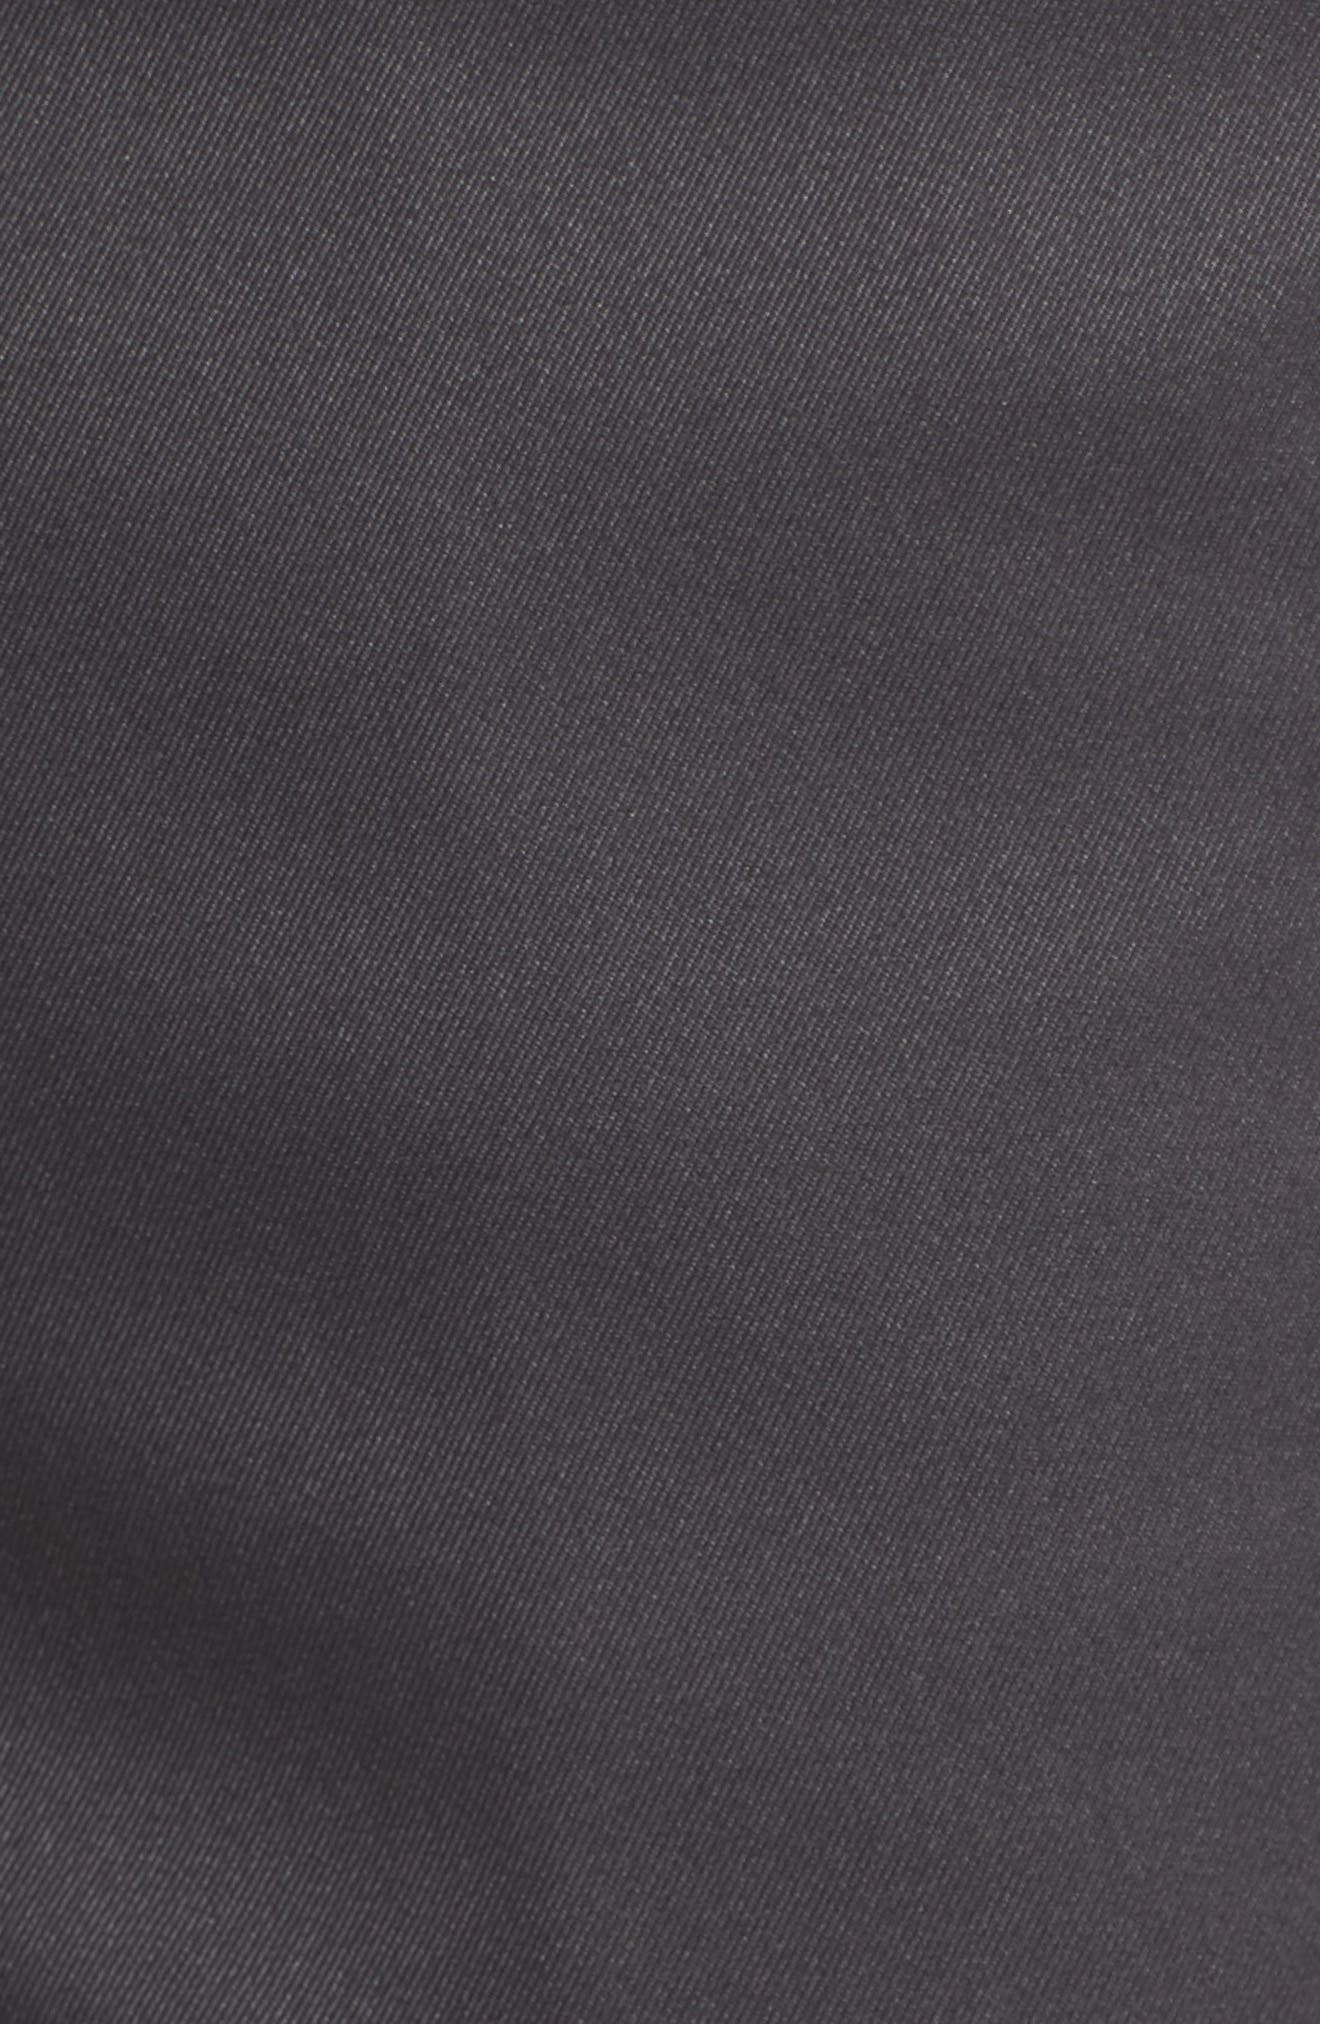 BOBBY JONES, Flat Front Tech Shorts, Alternate thumbnail 5, color, CHARCOAL